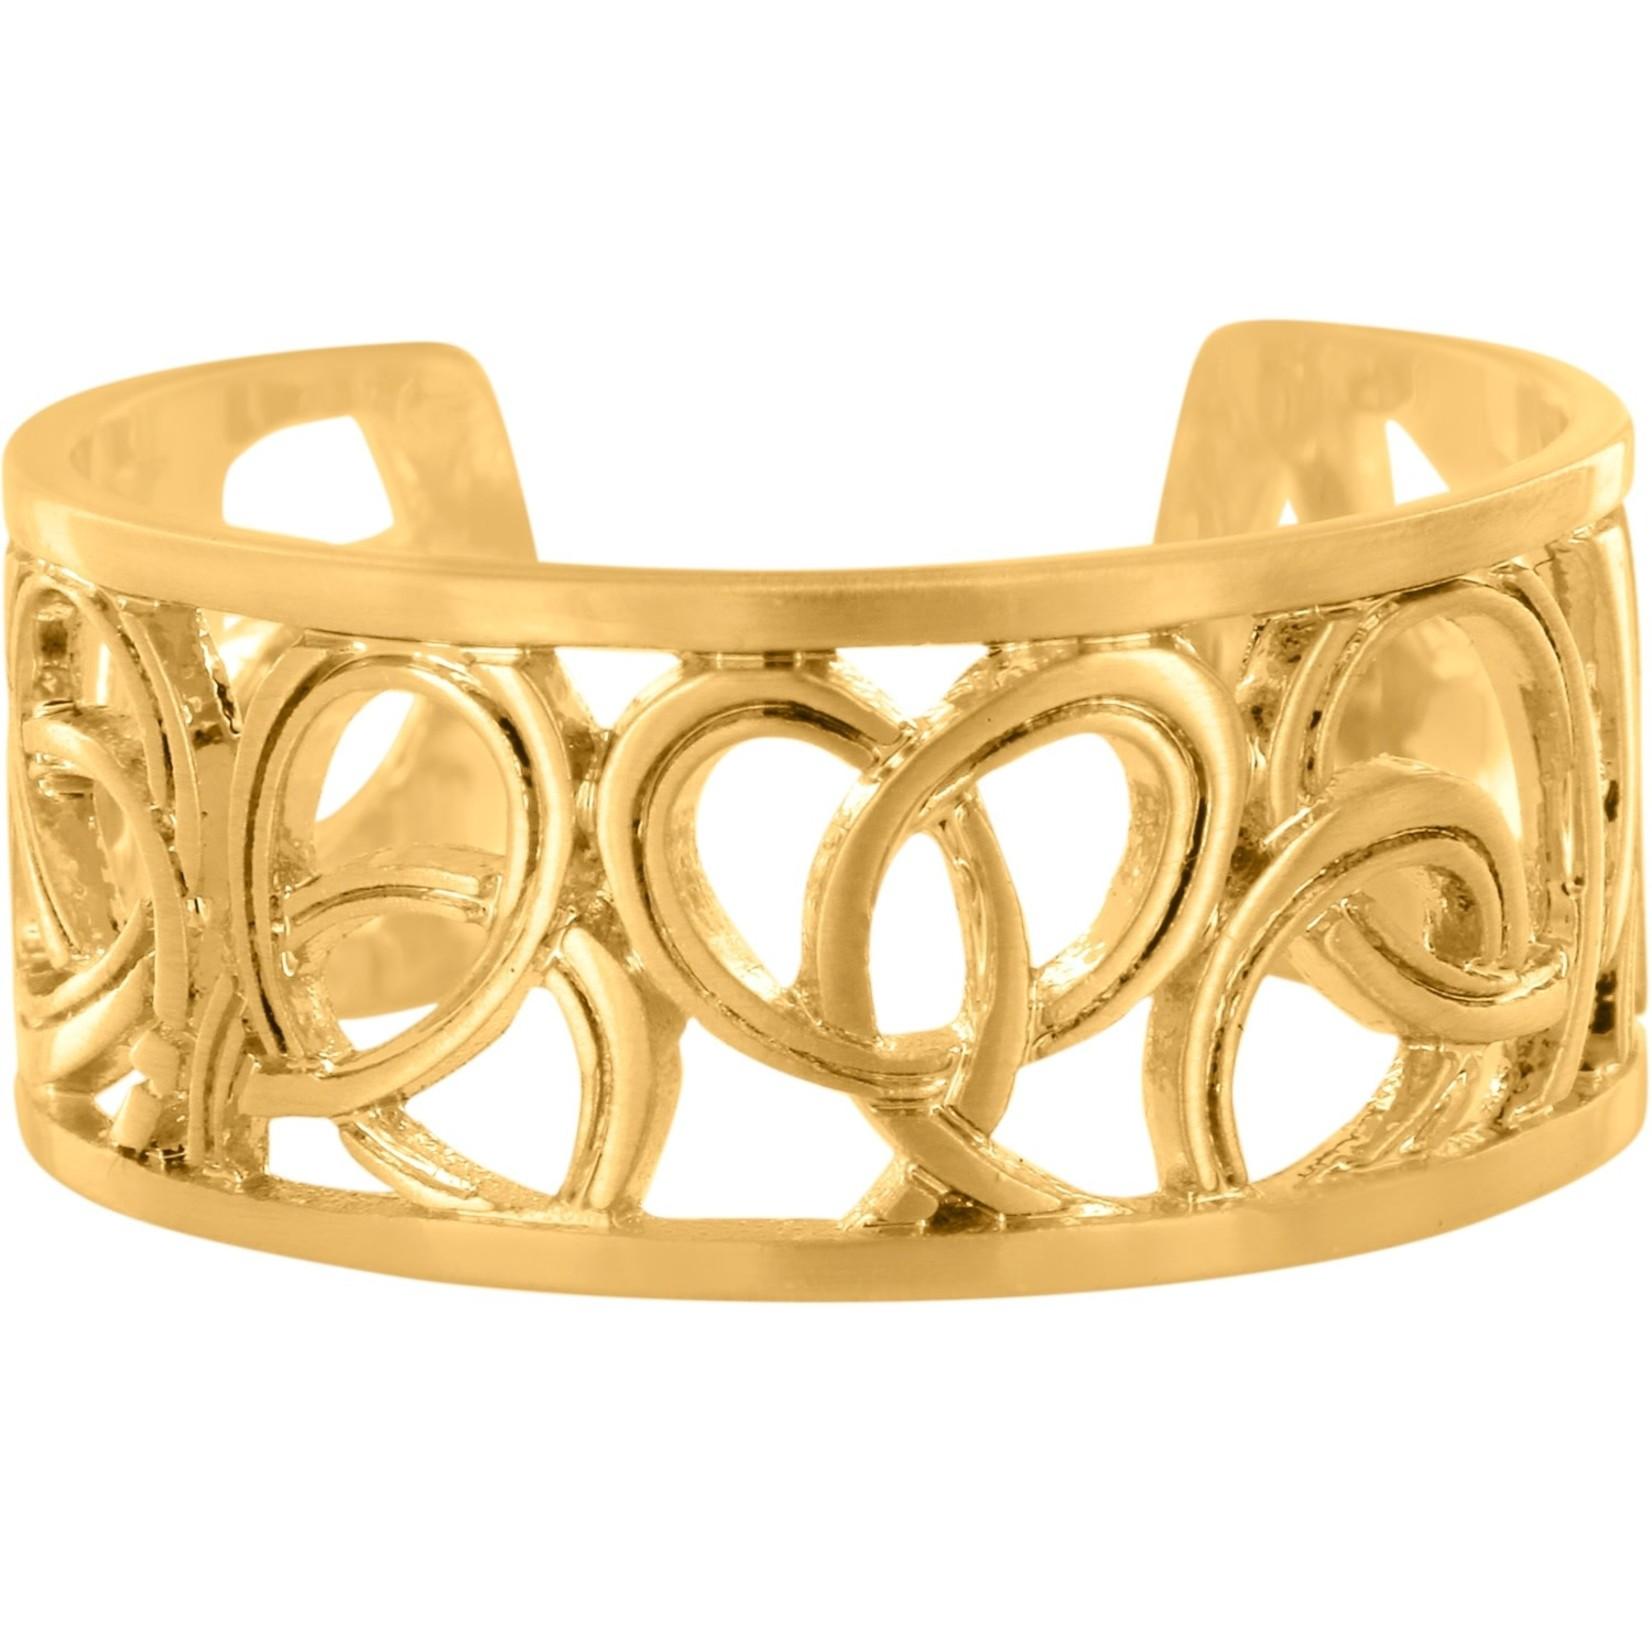 Brighton Christo Vienna Narrow Ring in Gold